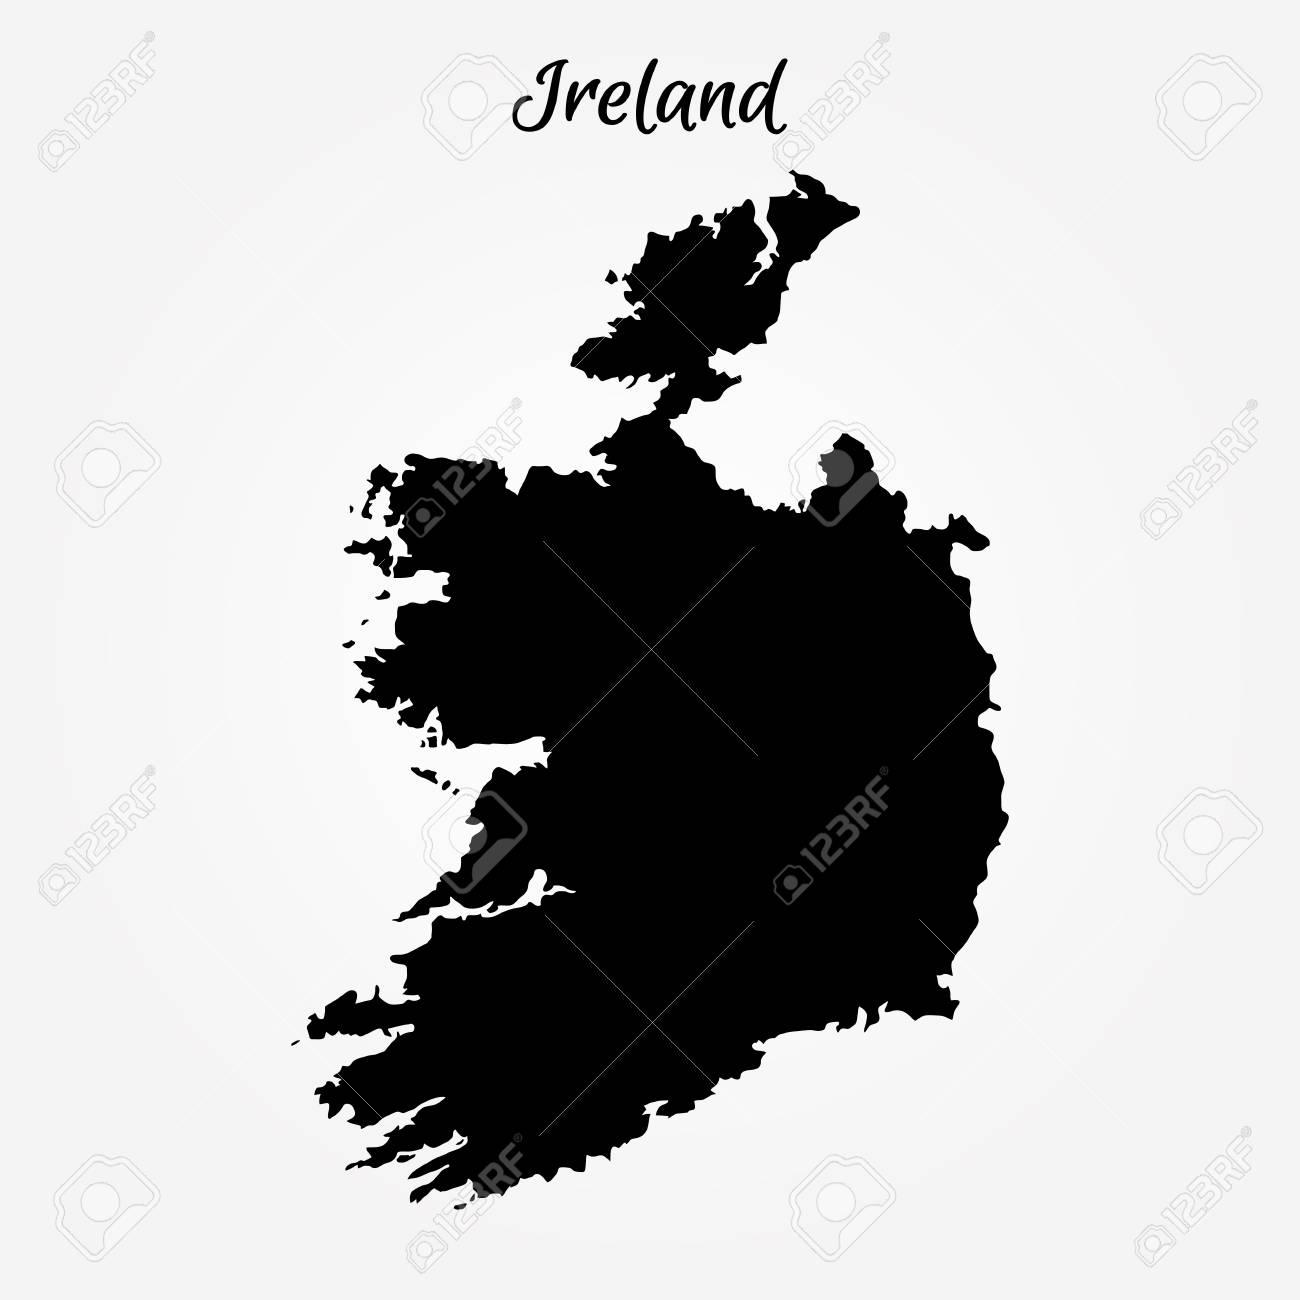 Map Of Ireland Vector.Map Of Ireland Vector Illustration World Map